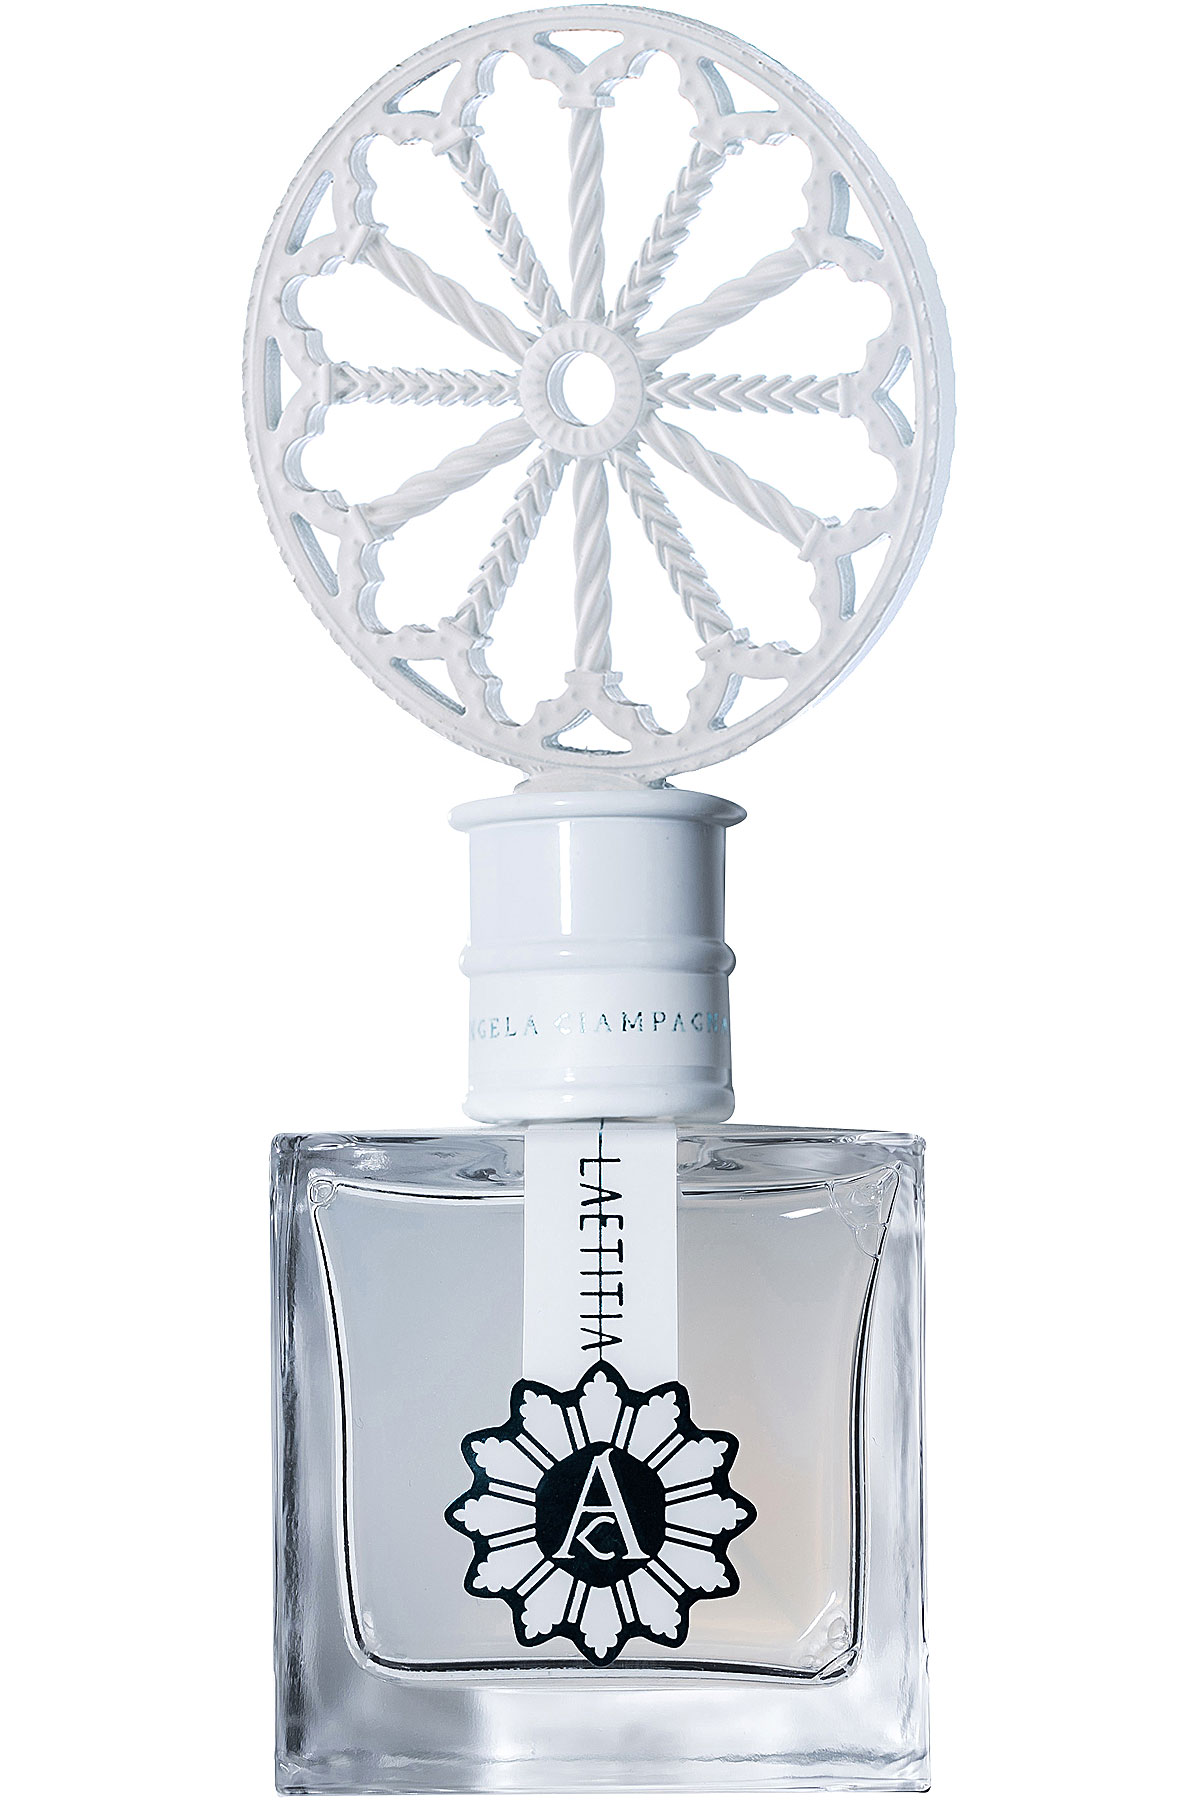 Angela Ciampagna Fragrances for Men, Laetitia - Scented Water - 100 Ml, 2019, 100 ml